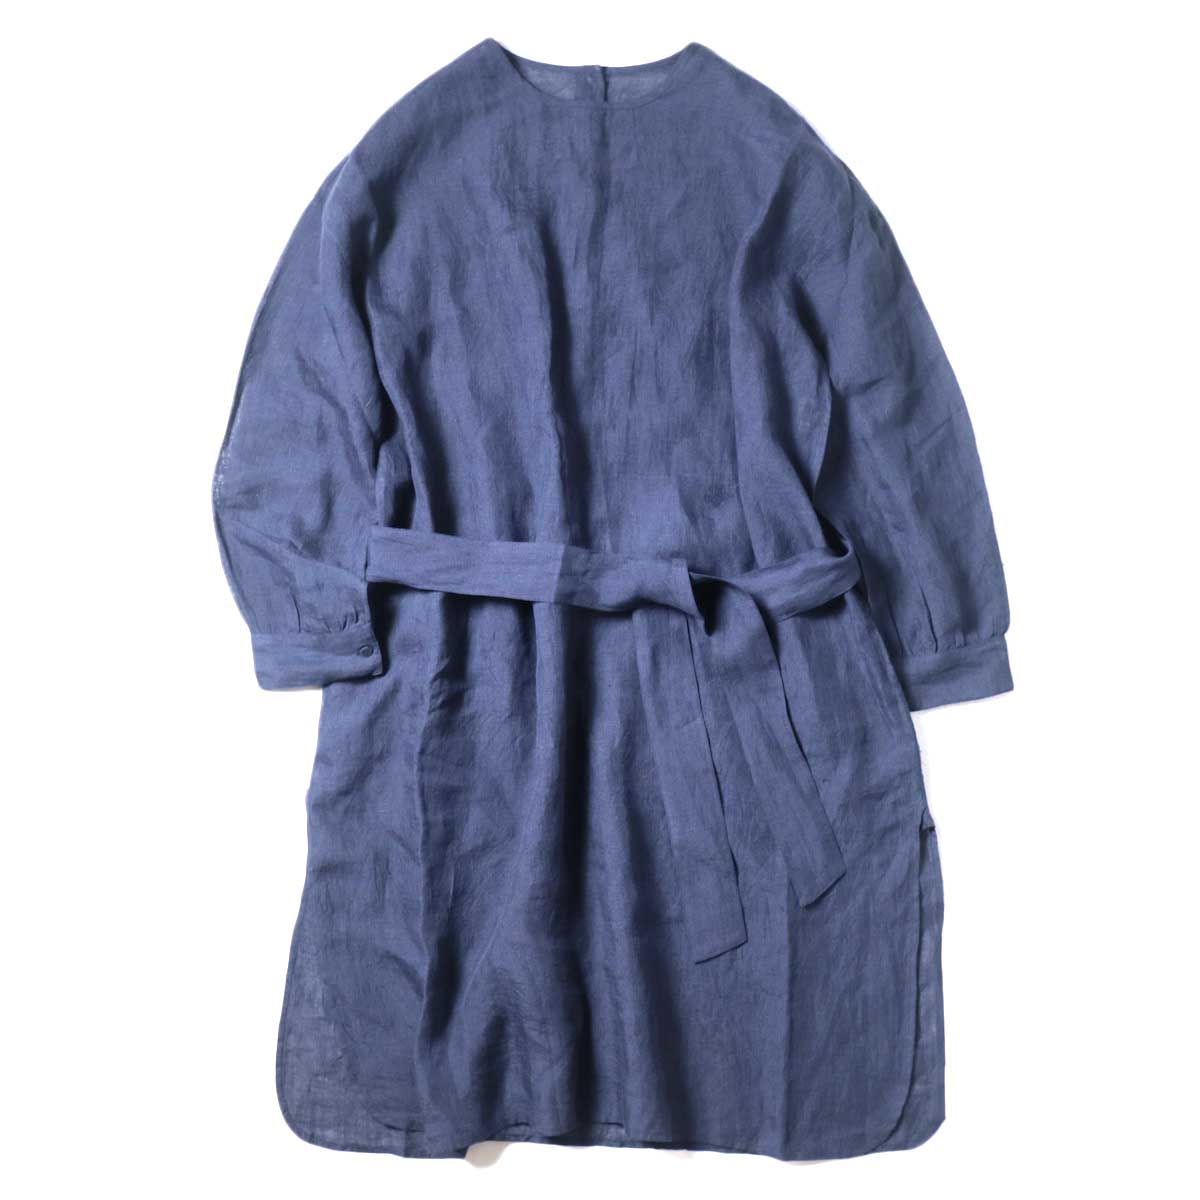 maison de soil / BACK OPENING CREN-NECK SHIRT DRESS (Navy) 正面